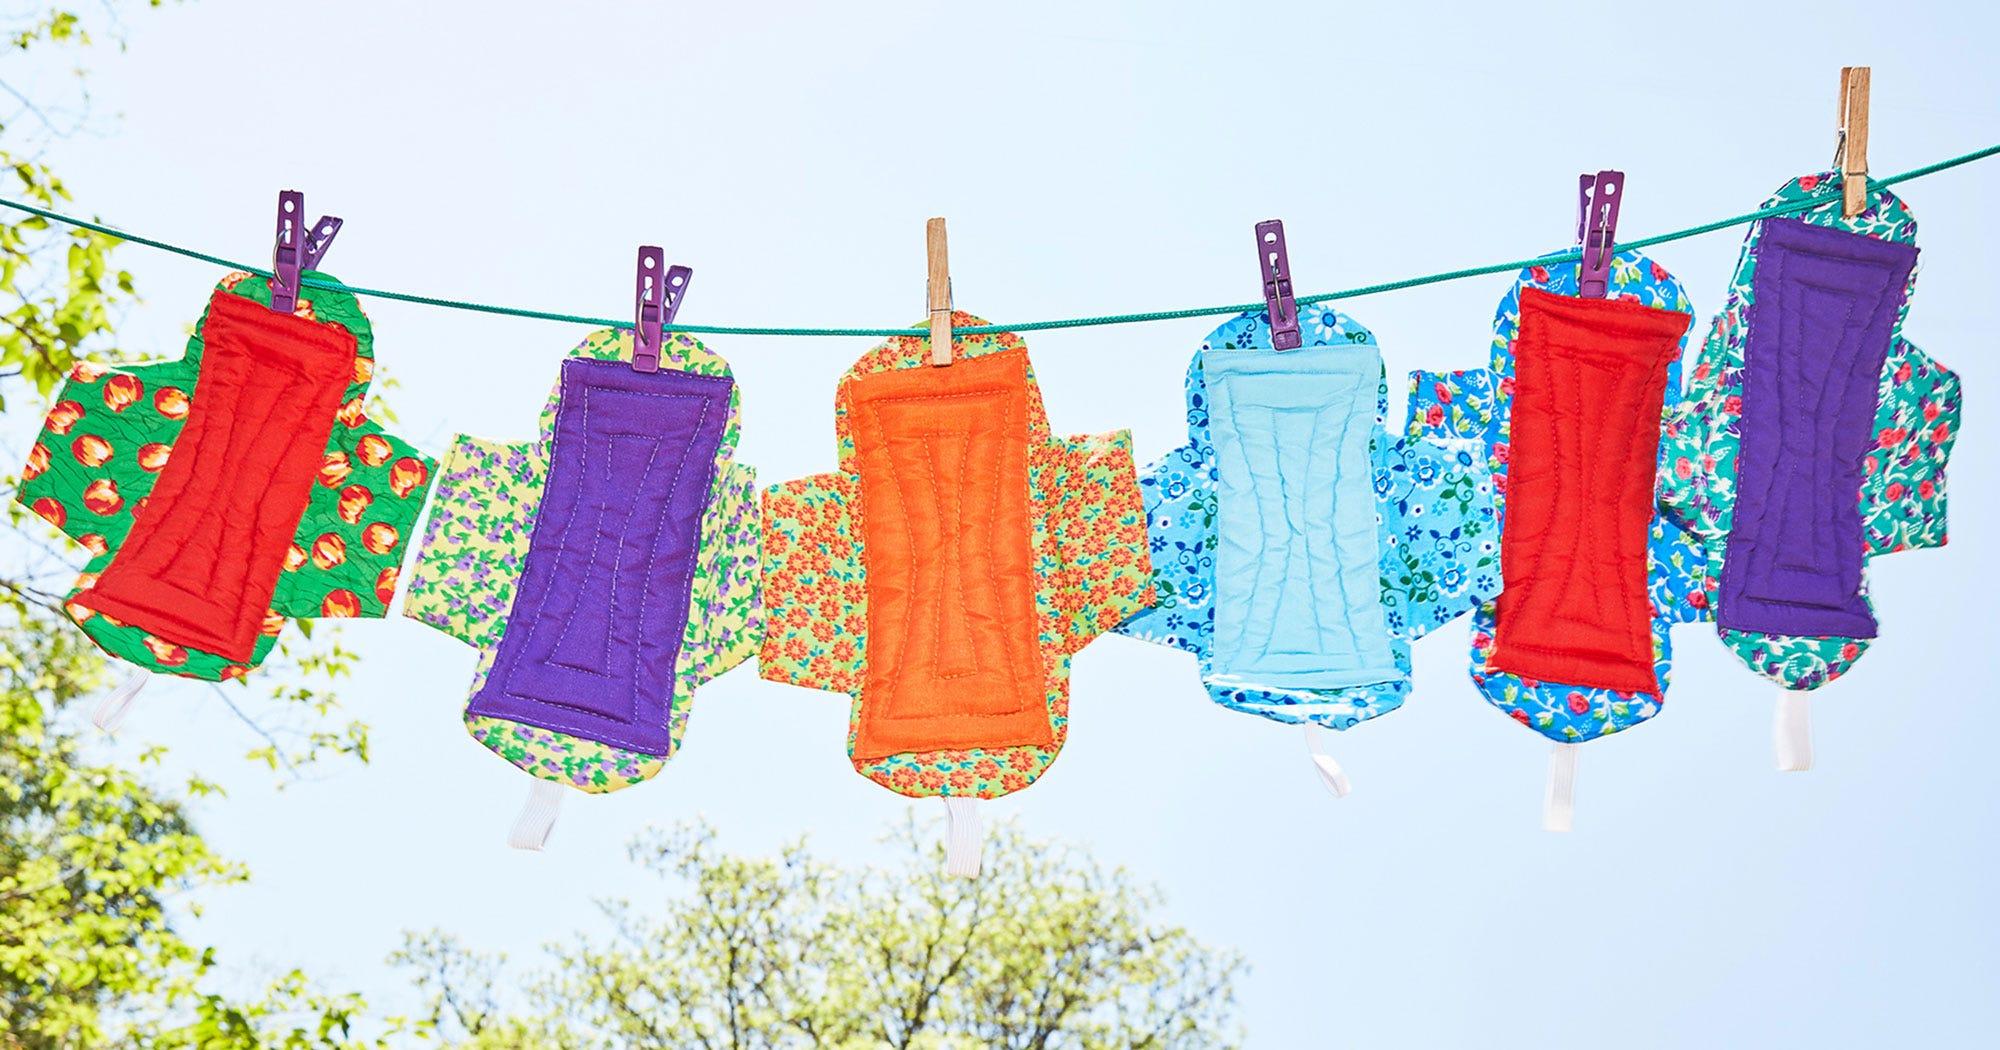 Reusable Pads, Sanitary Menstrual Products Malawi Girls